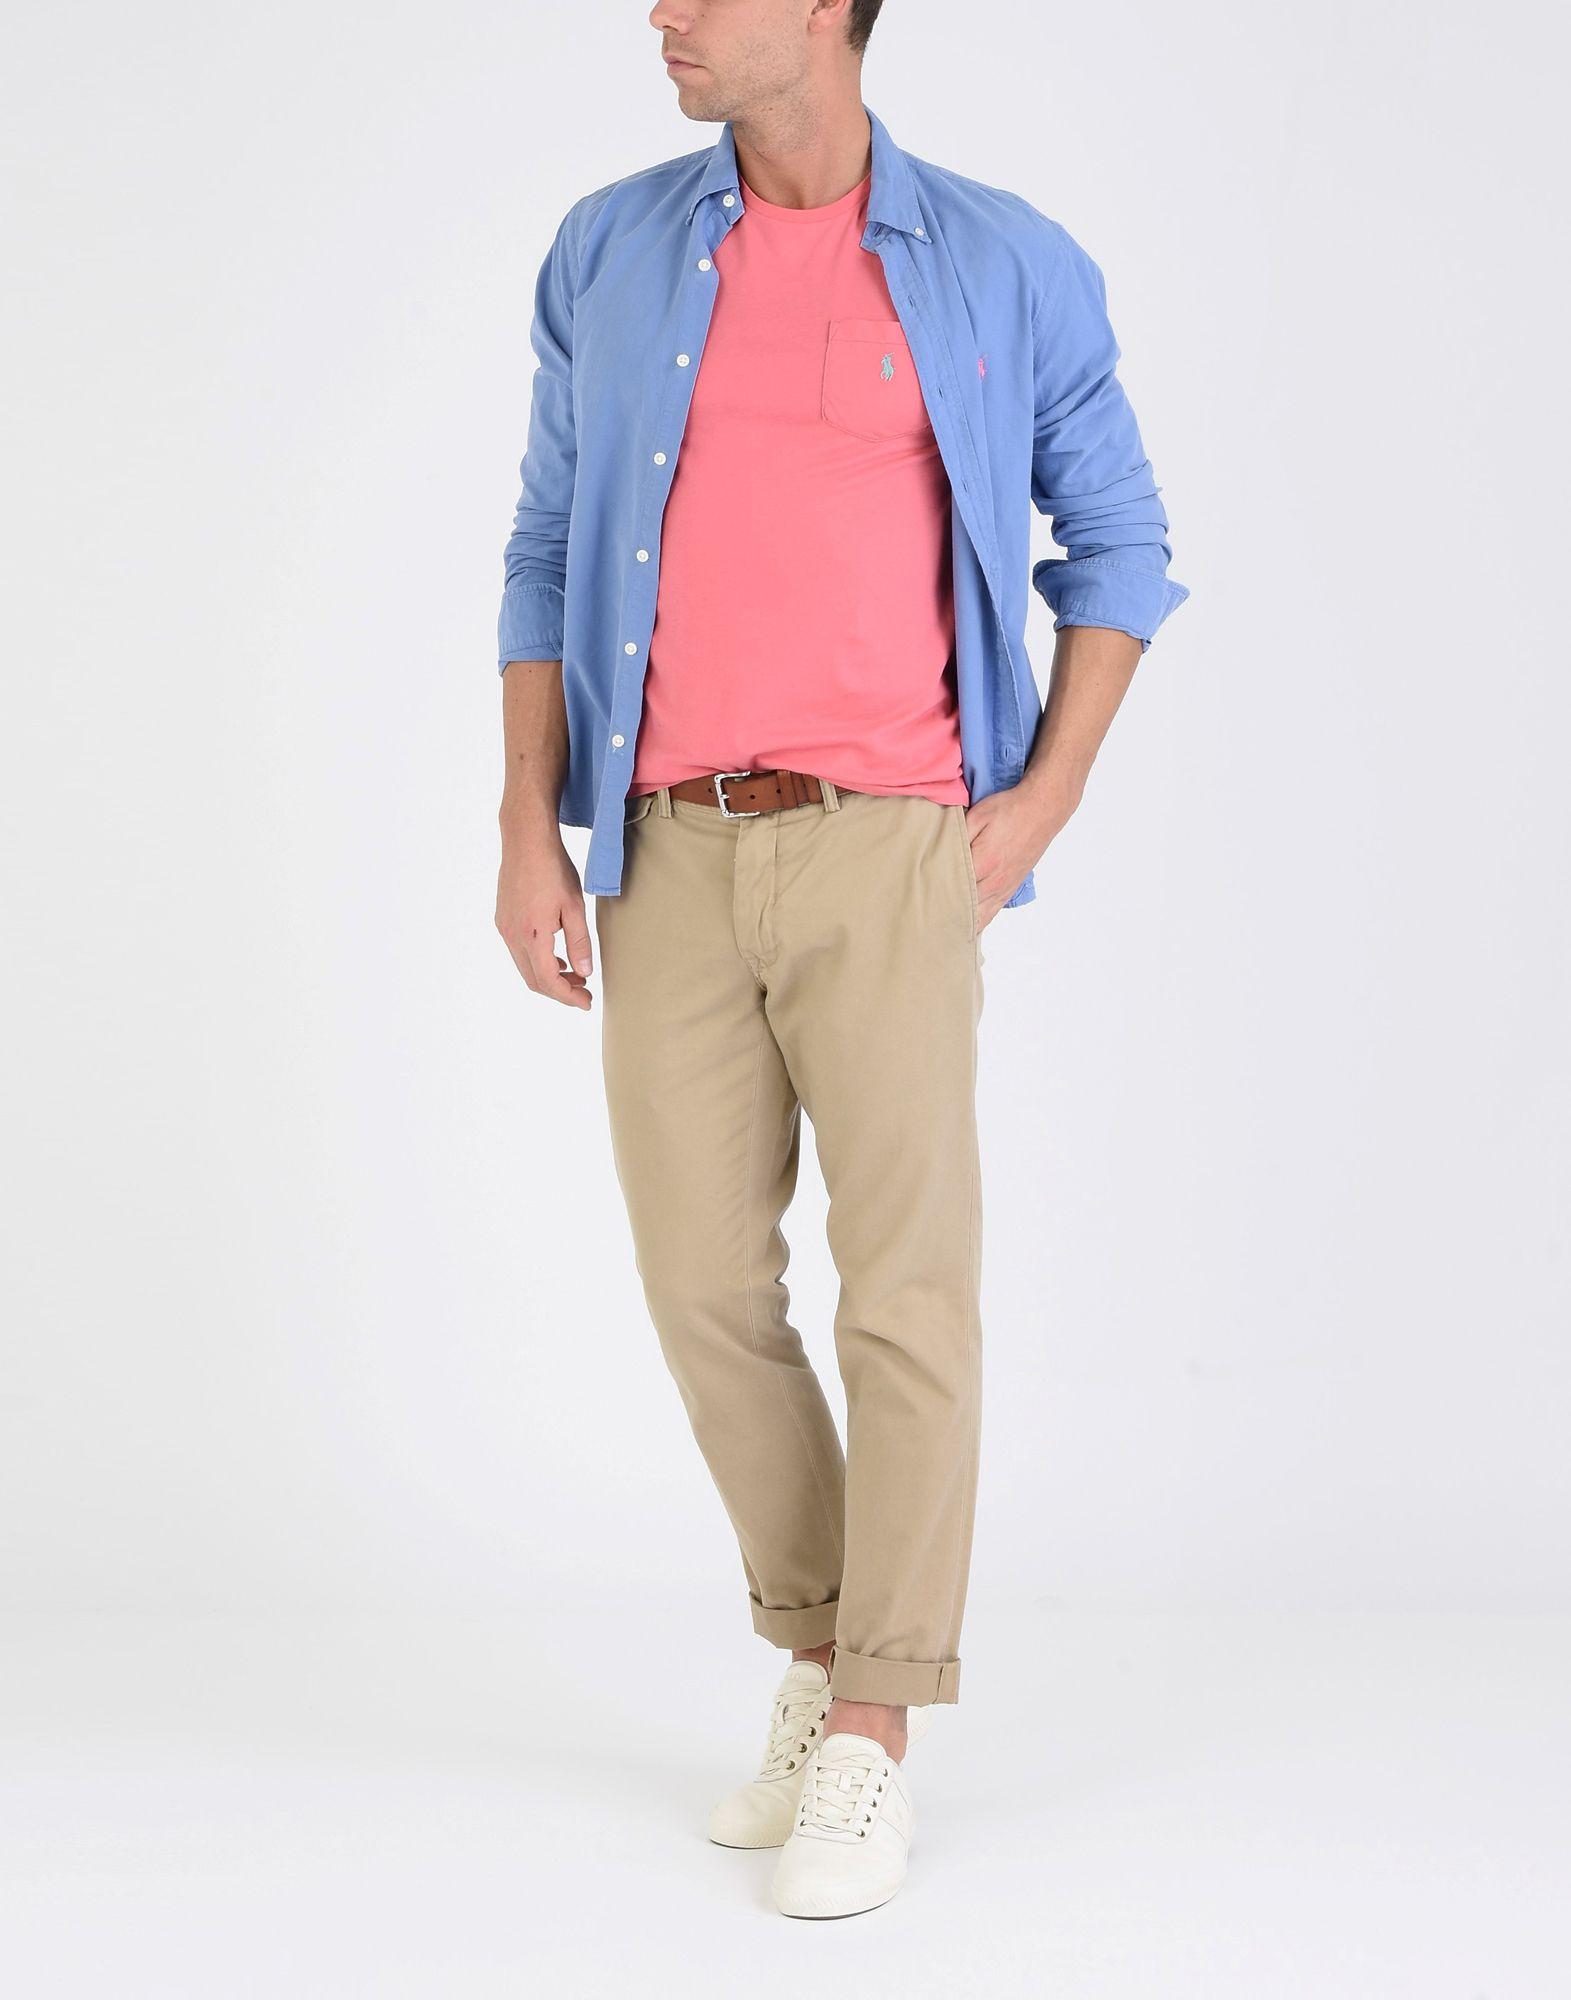 T-Shirt Polo Ralph Lauren Custom Fit Shirt T Shirt Fit - Uomo - 12121399LH 5b880e